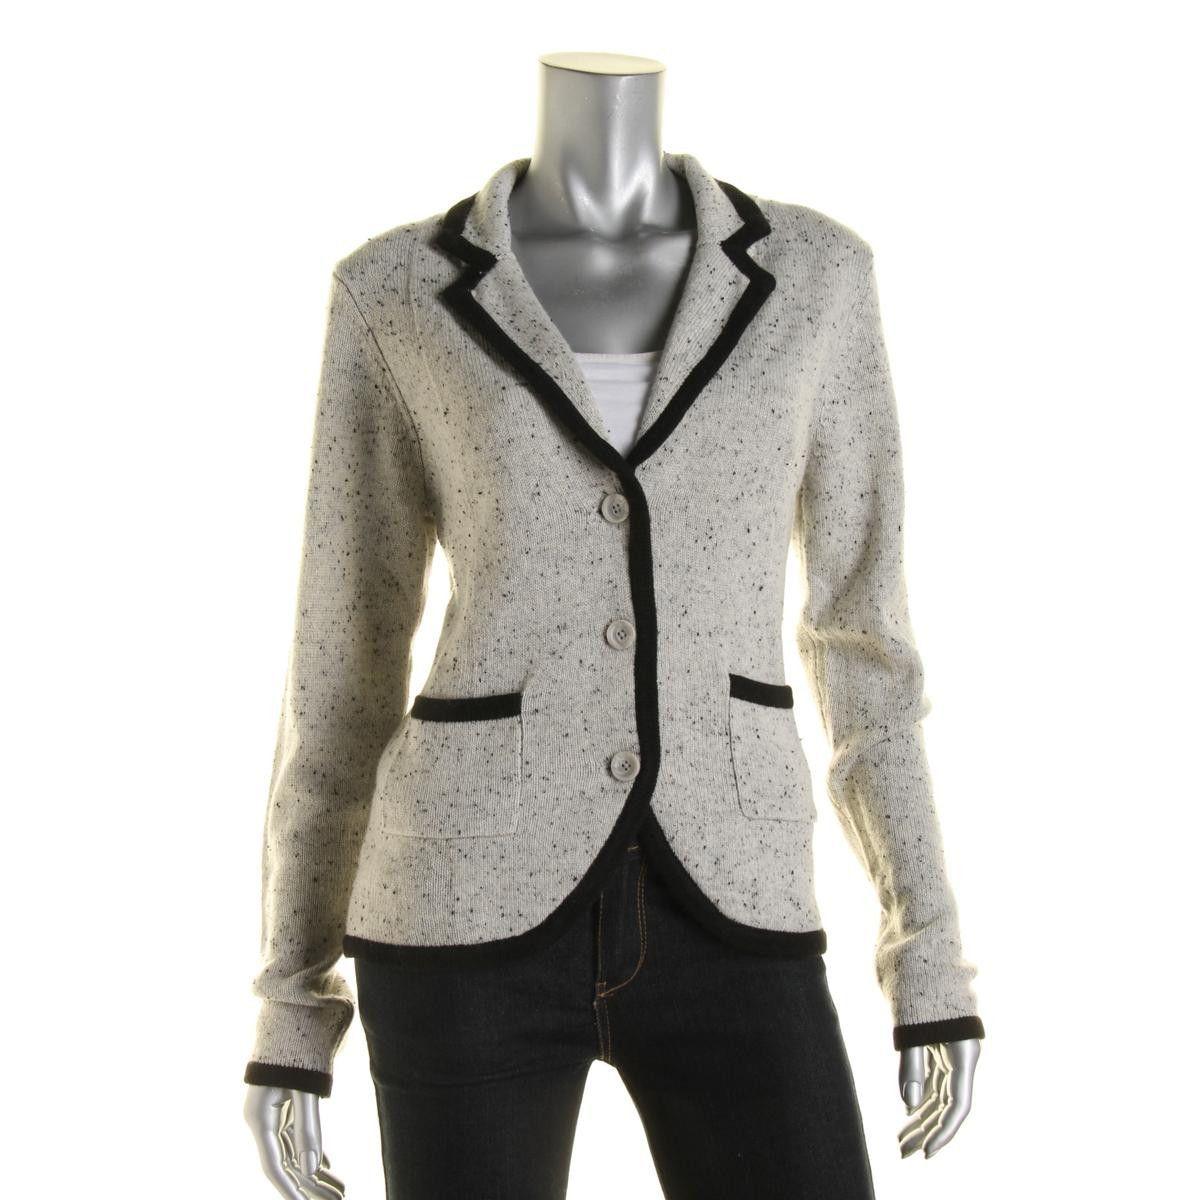 Private Label Womens Contrast trim Cashmere Cardigan Sweater ...